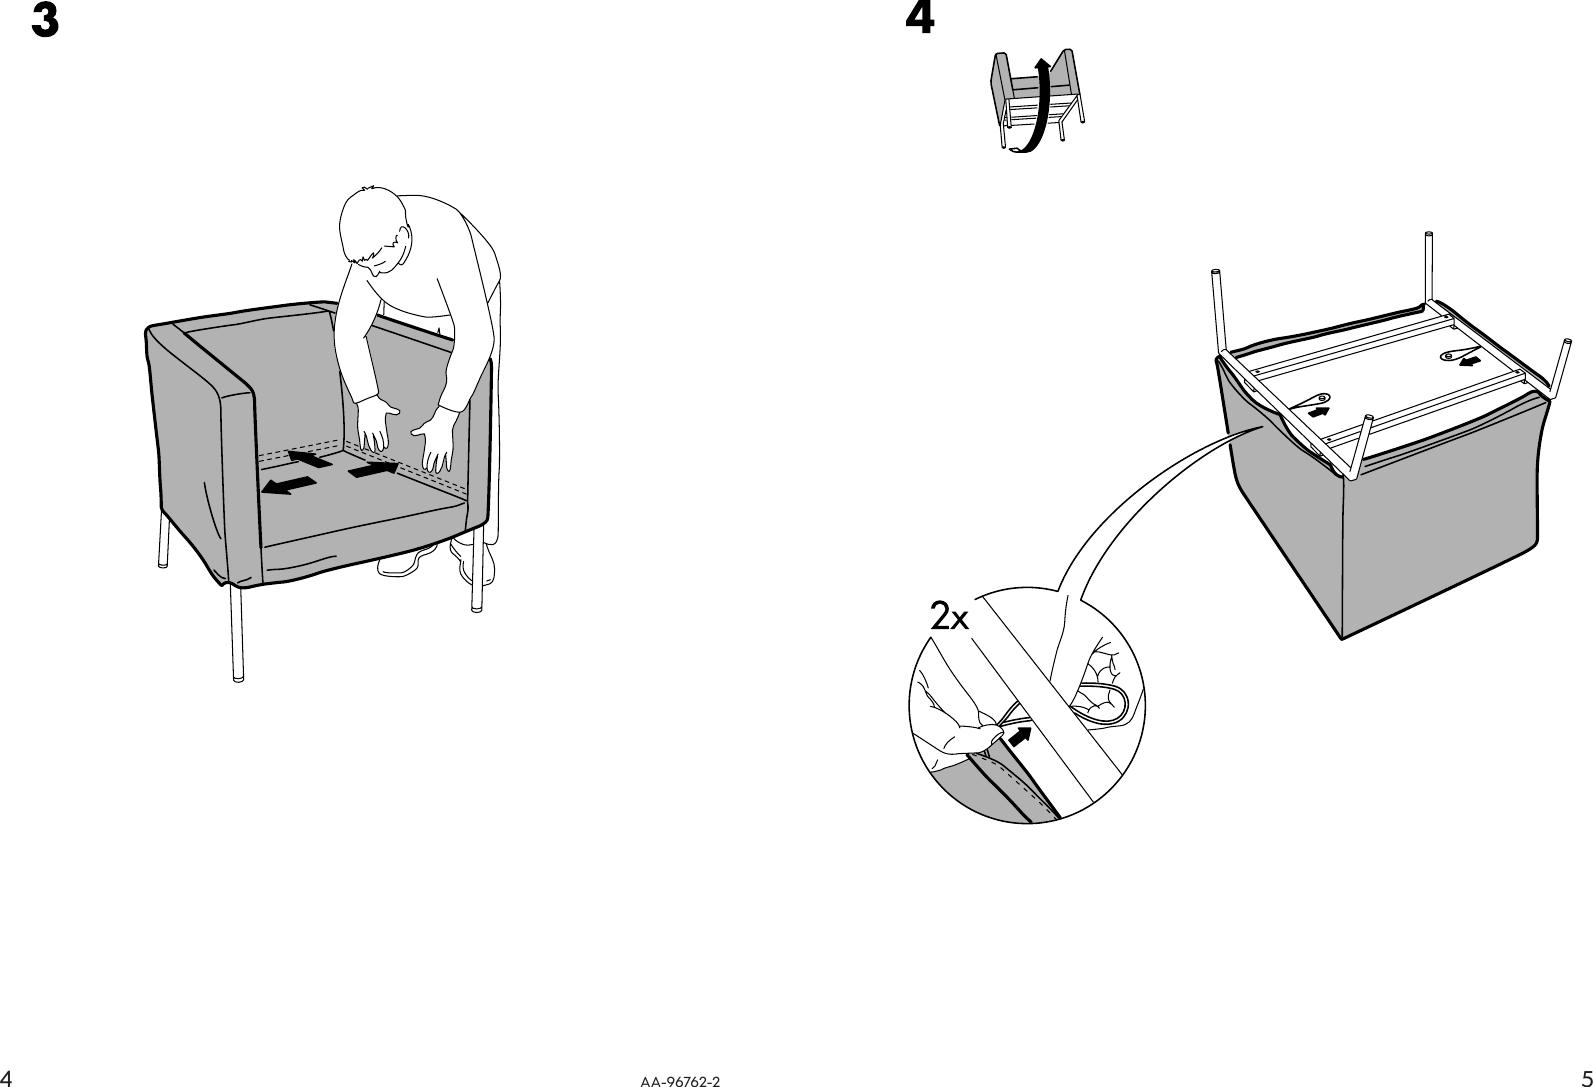 Astonishing Ikea Klappsta Chair Cover Assembly Instruction Inzonedesignstudio Interior Chair Design Inzonedesignstudiocom